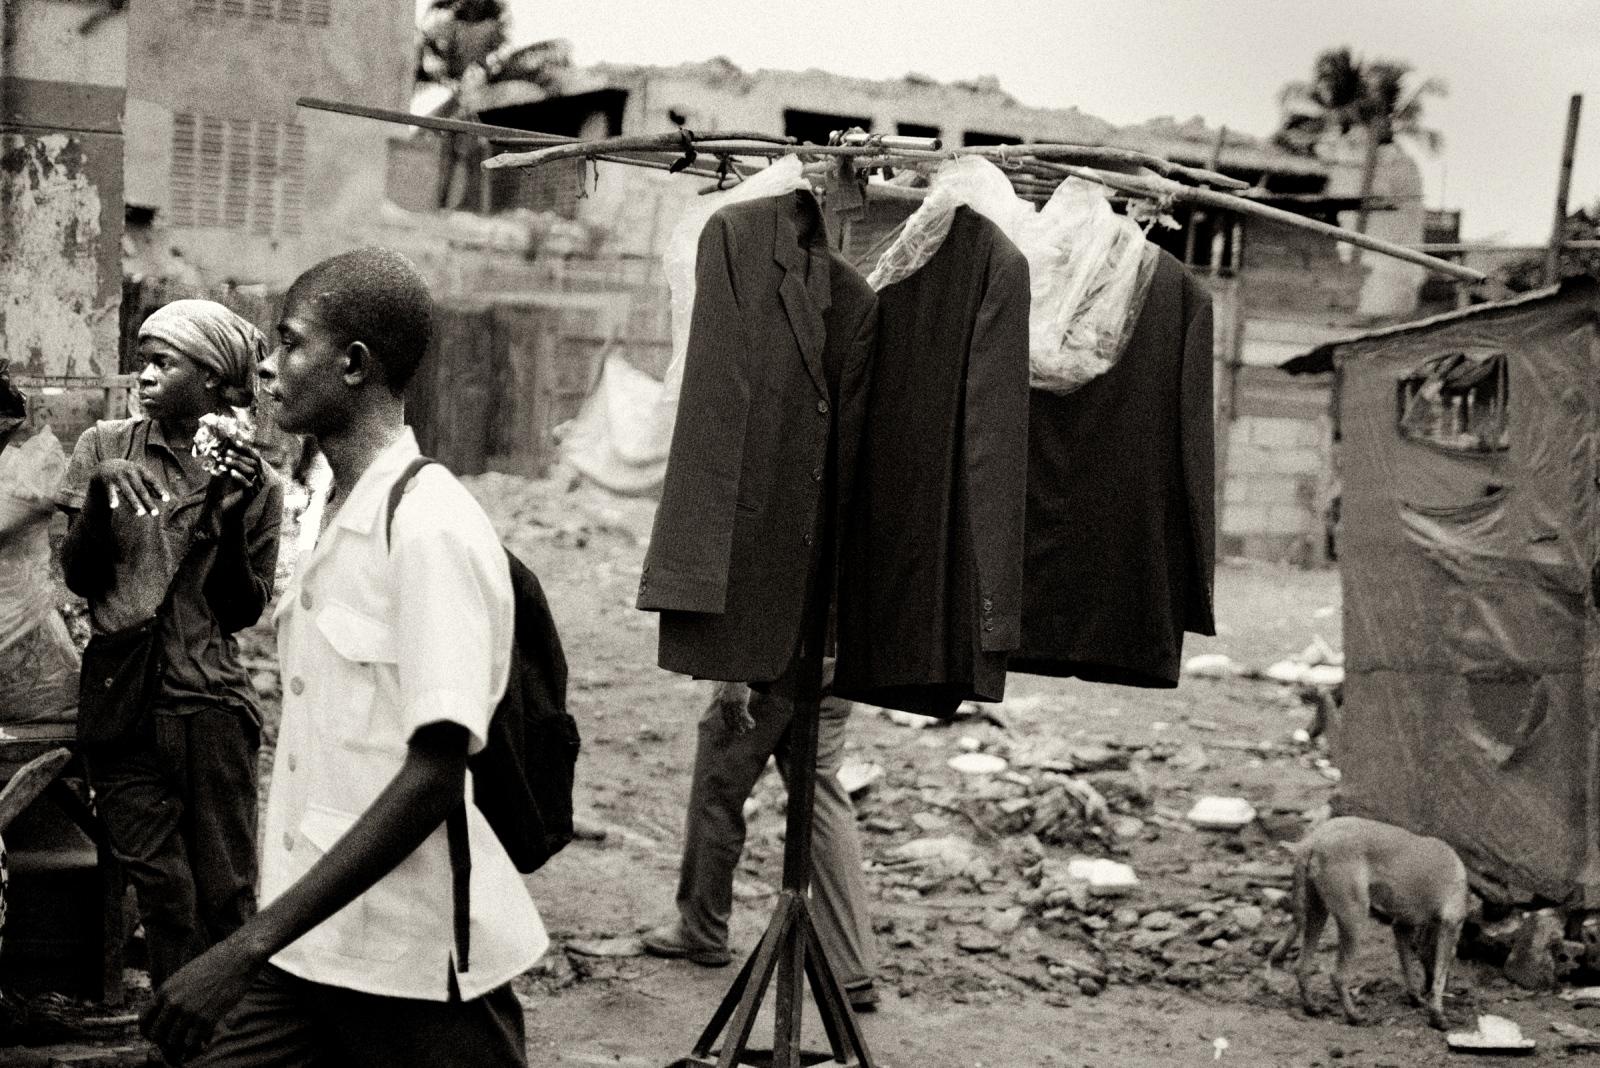 Art and Documentary Photography - Loading P1020079_copy.jpg